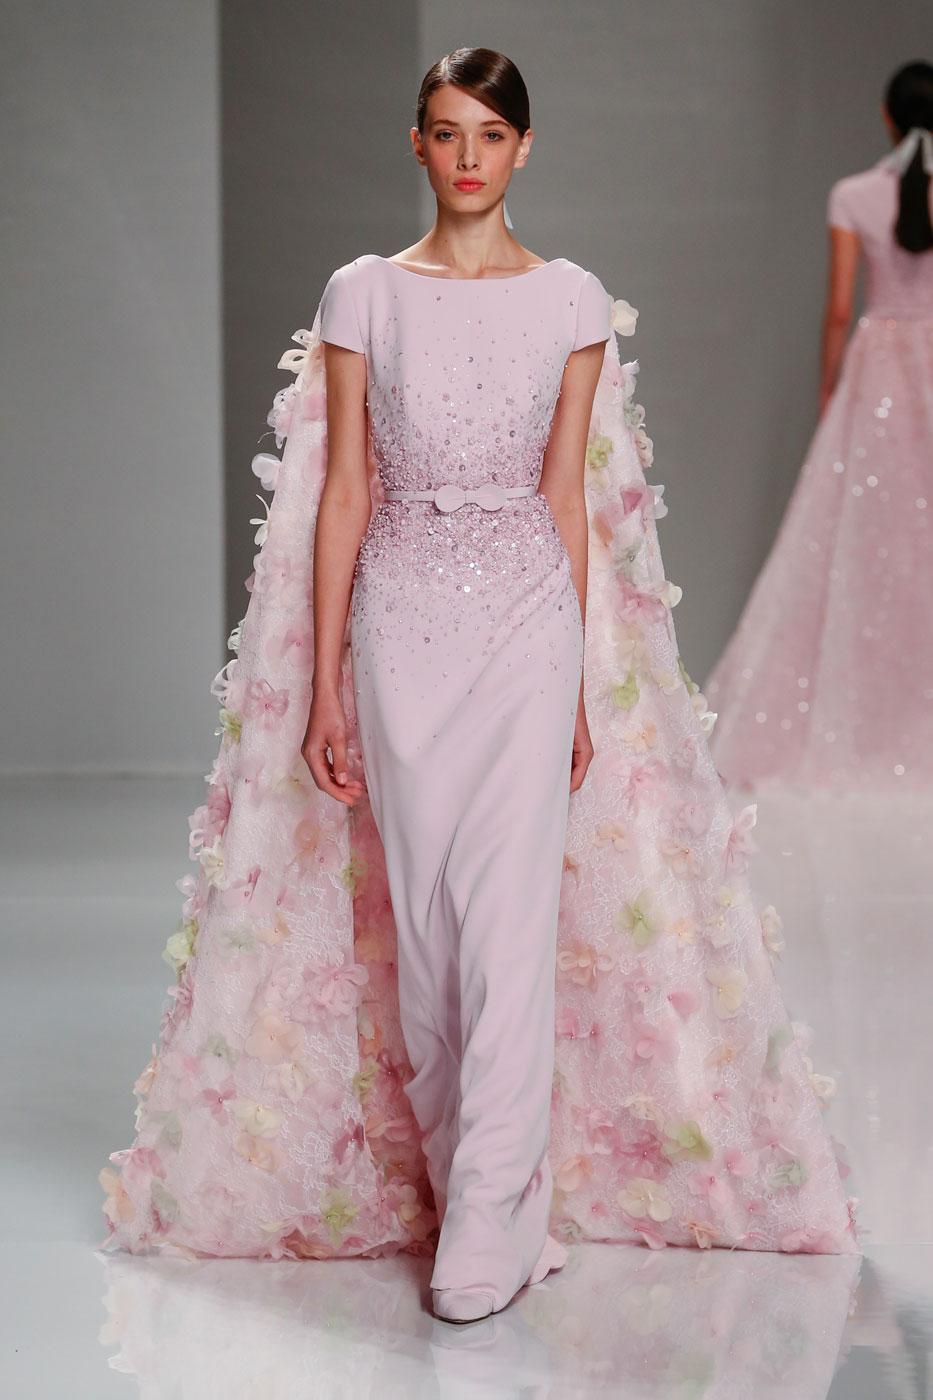 Georges-Hobeika-fashion-runway-show-haute-couture-paris-spring-2015-the-impression-81